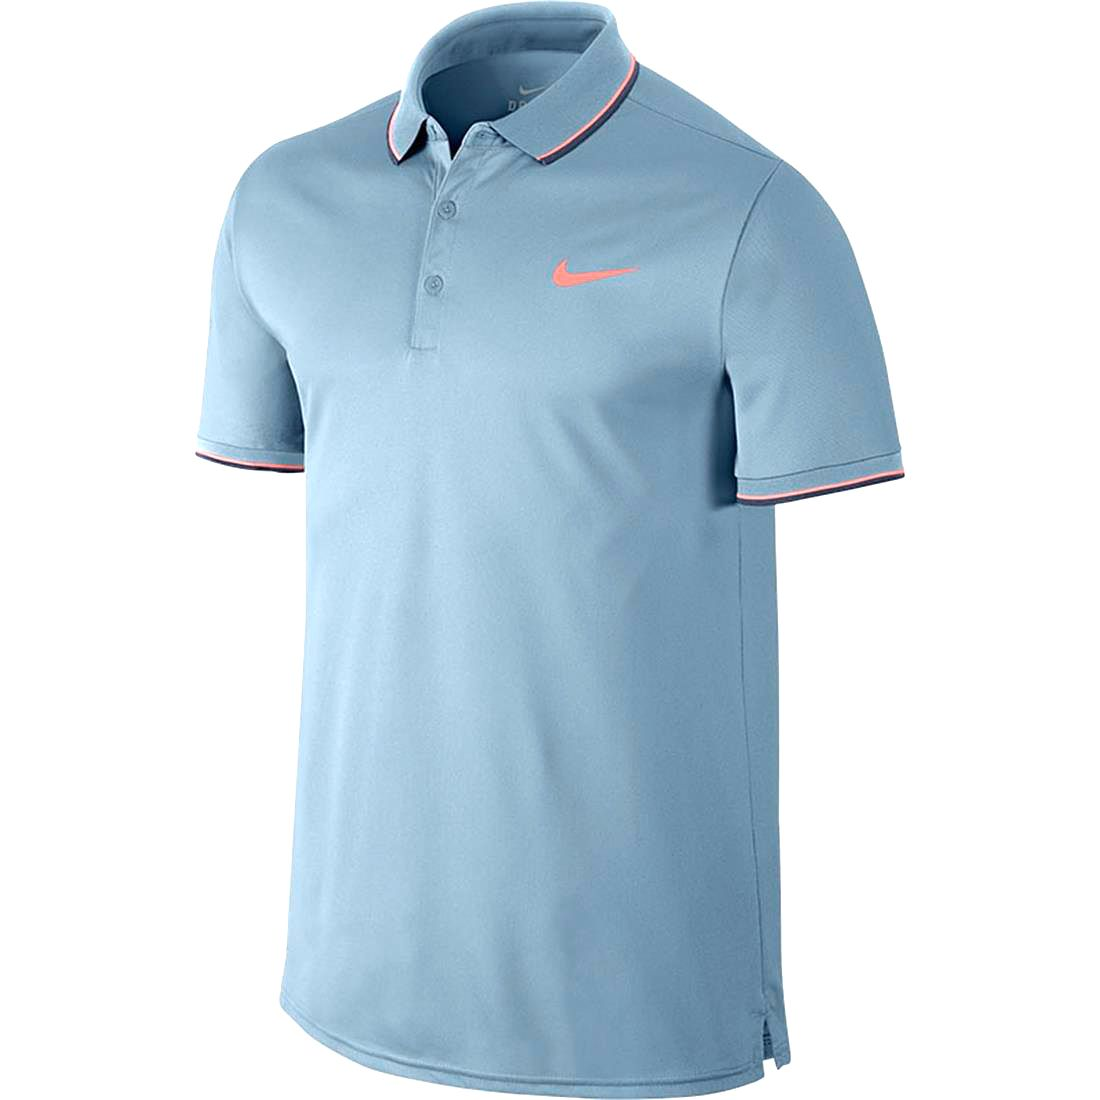 Camisa Polo Masculina Nike Court - BRACIA SHOP  Loja de Roupas ... f18e8ddf2acae